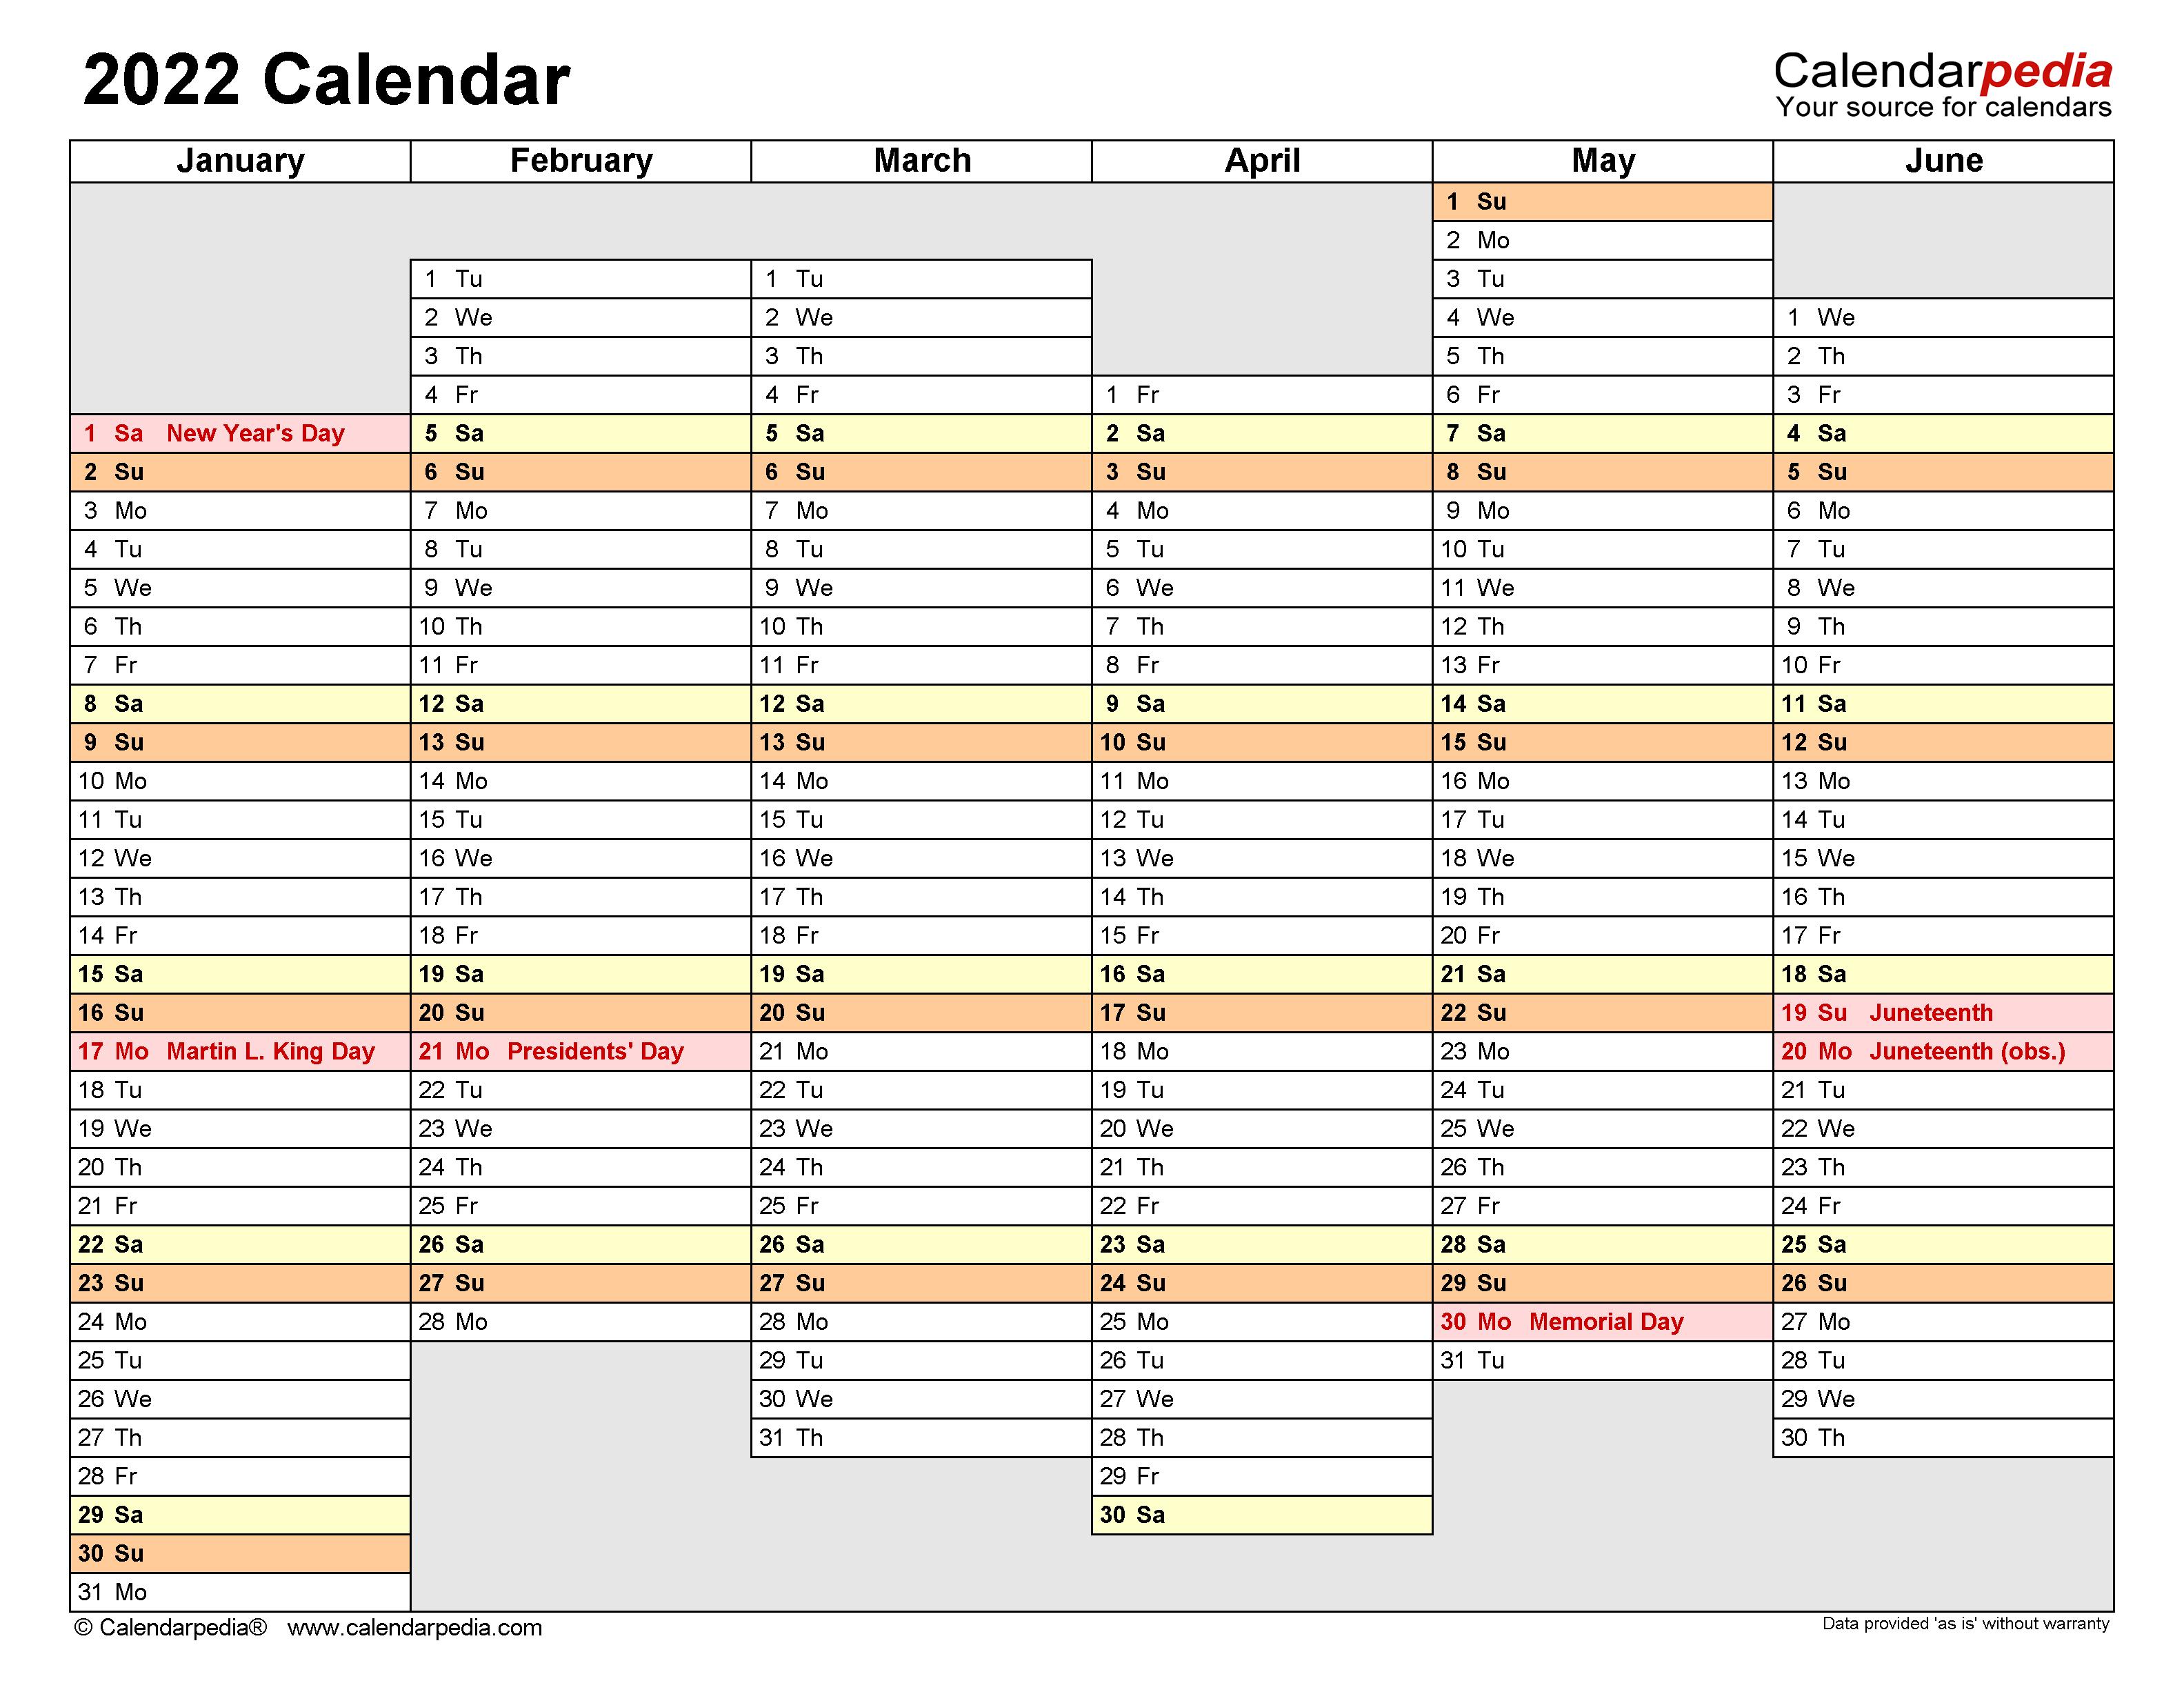 2022 Yearly Calendar.2022 Calendar Free Printable Word Templates Calendarpedia